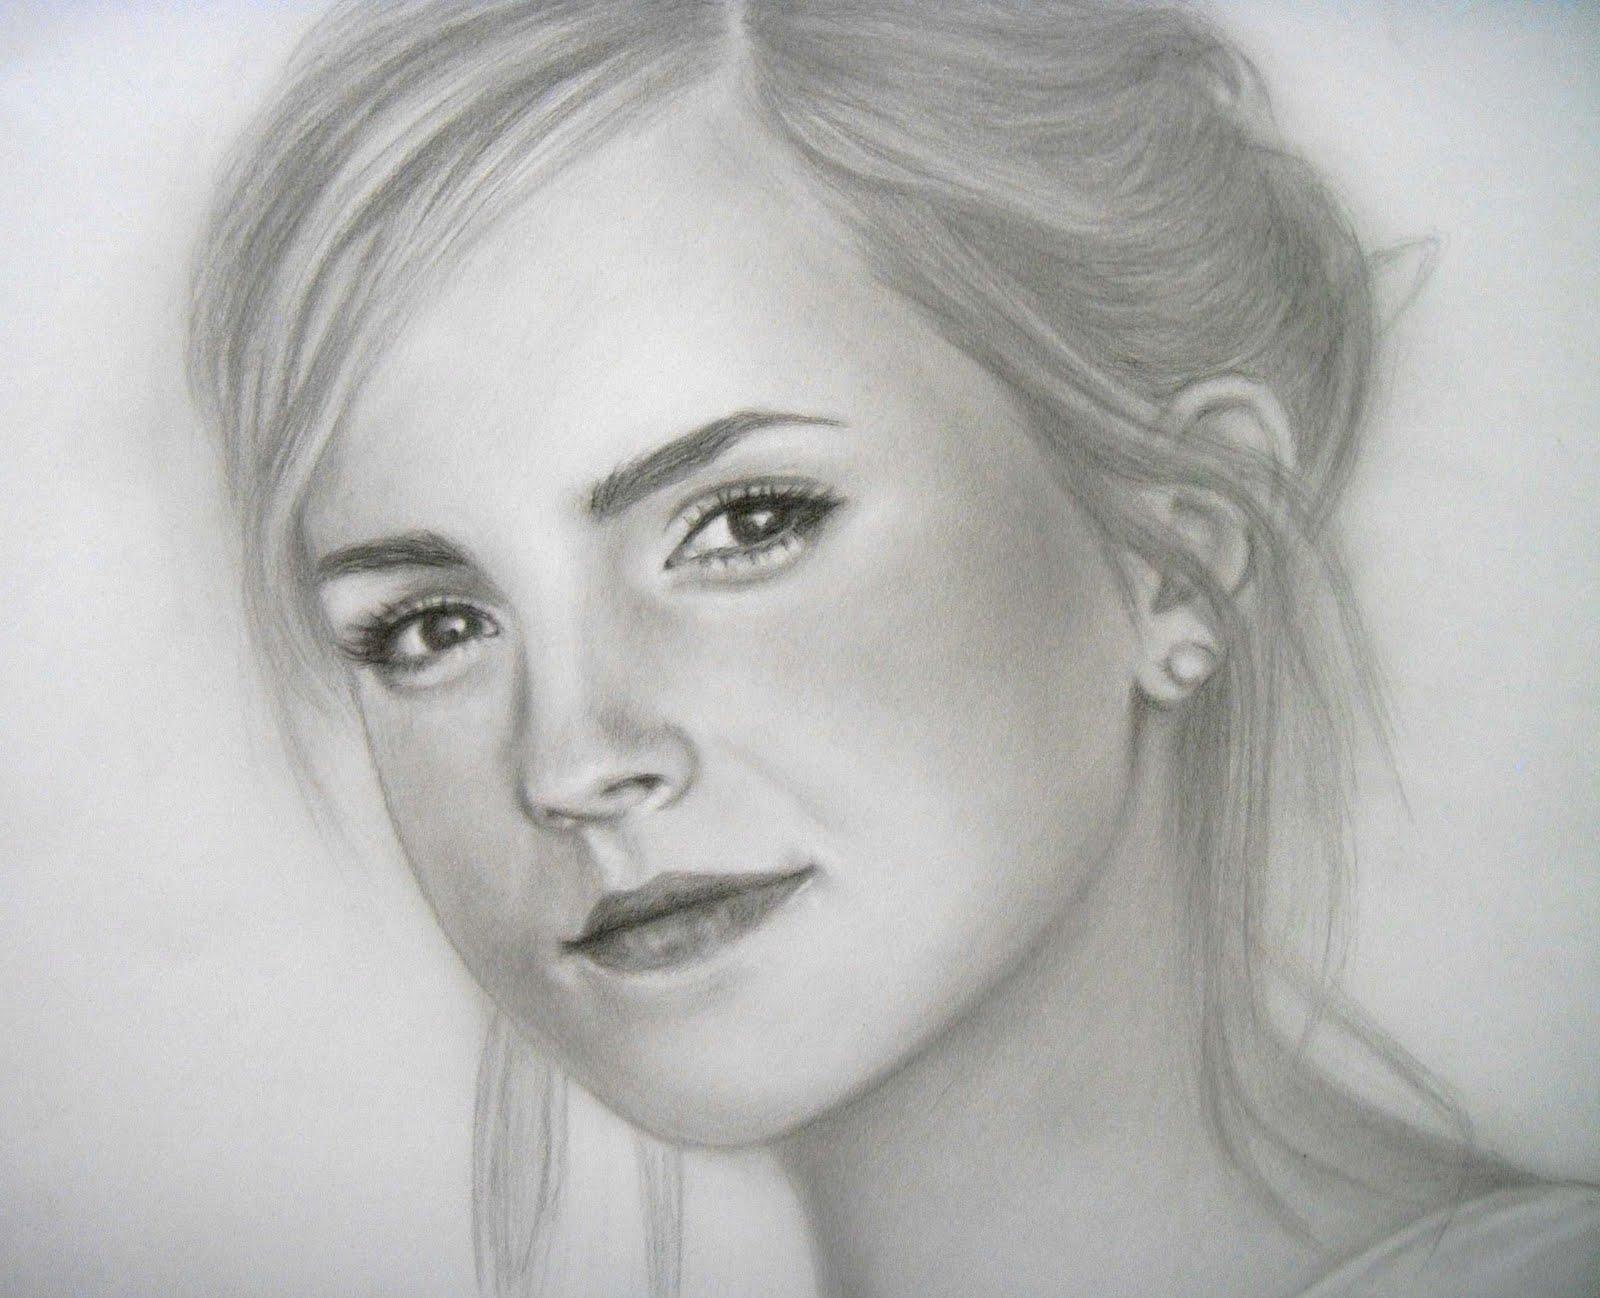 Drawn portrait emma watson Grace A 2 pencil Progress